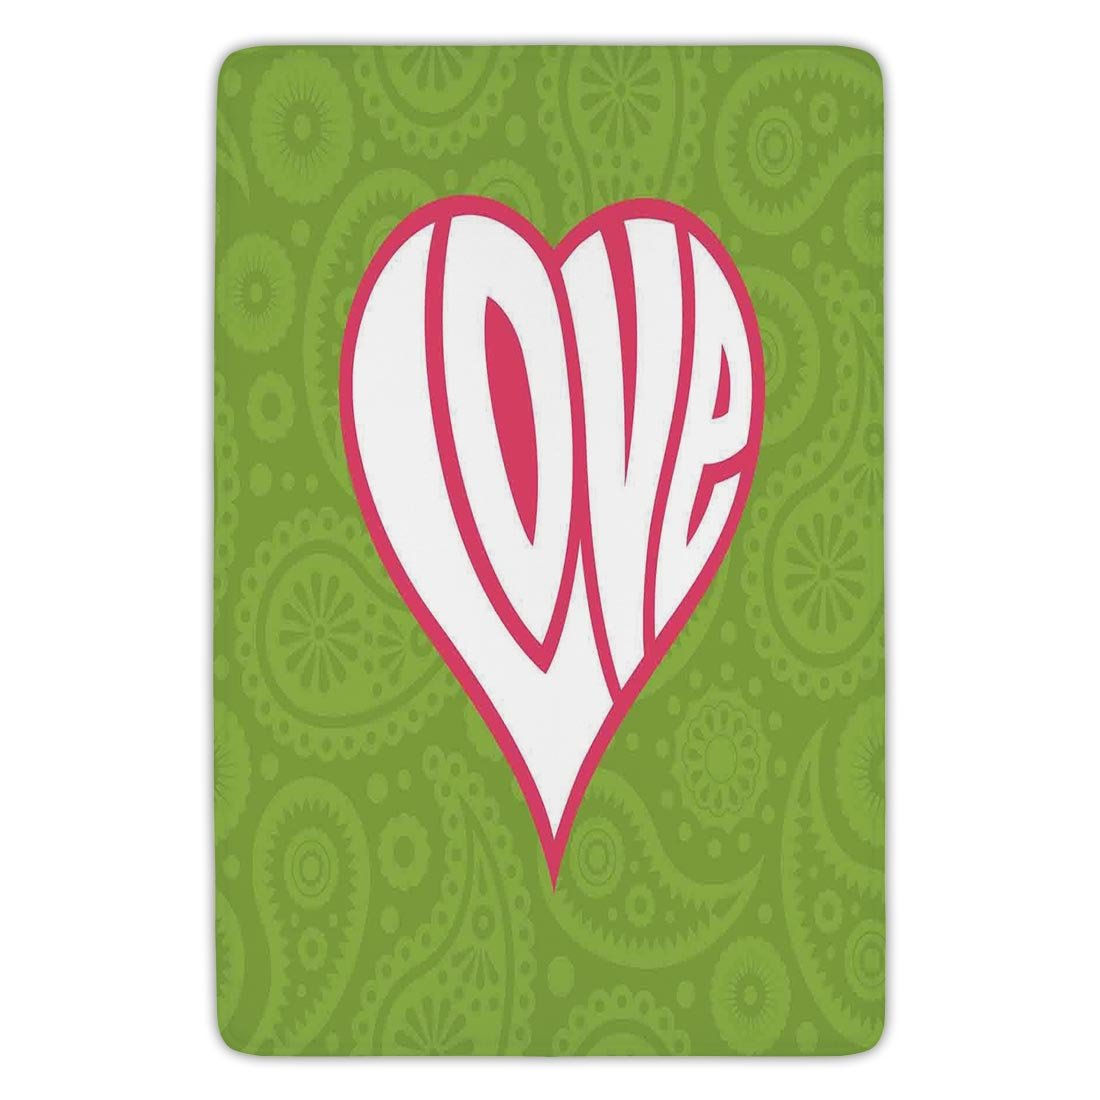 Bathroom Bath Rug Kitchen Floor Mat Carpet,Groovy Decorations,Heart Illustration on Paisley Background Centre of Love Nutrient Retro Design,Green White Pink,Flannel Microfiber Non-slip Soft Absorbent